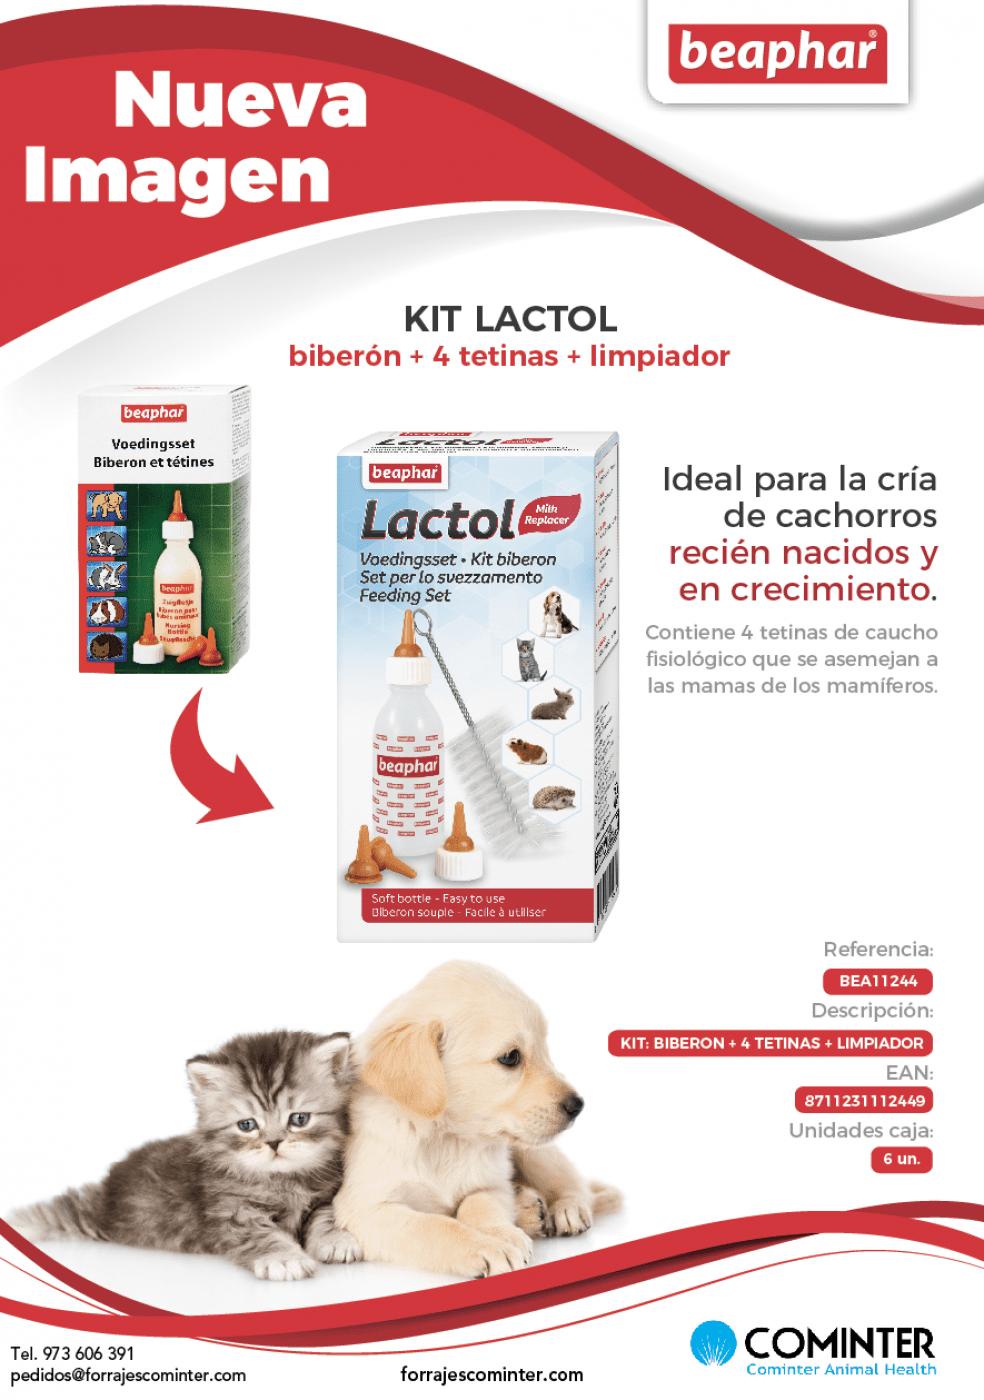 nueva imagen kit lactol beaphar